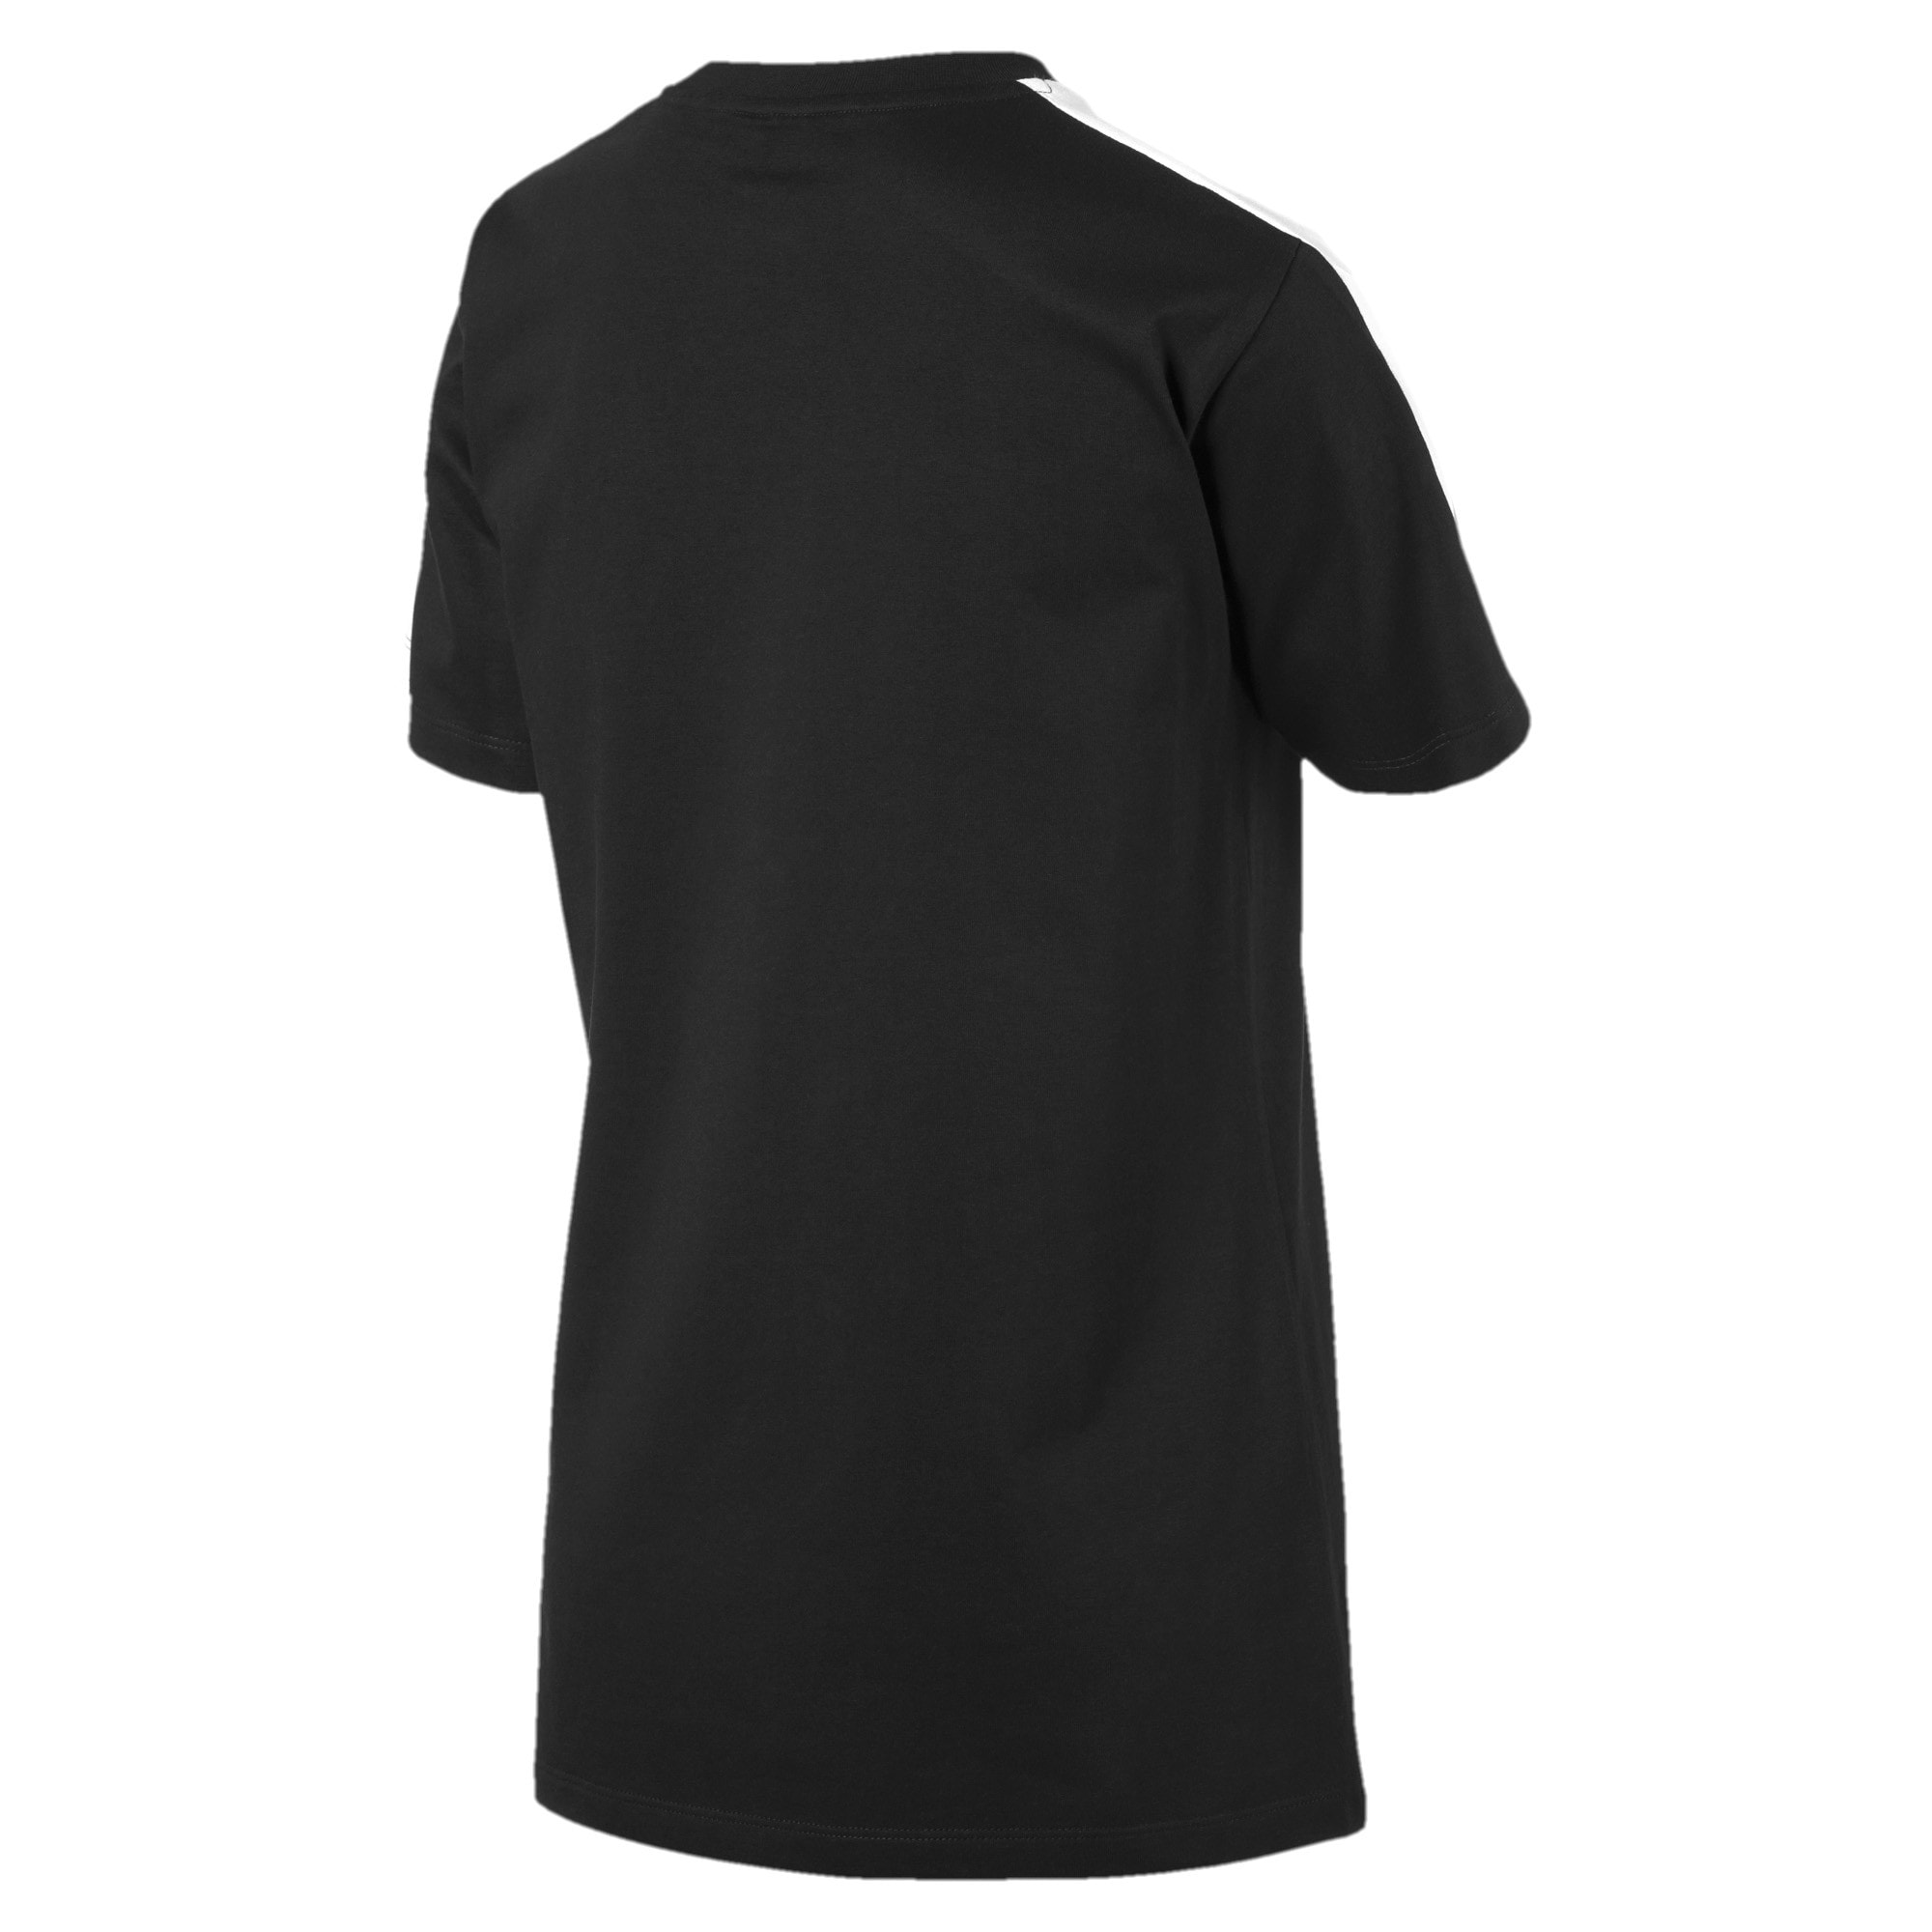 Miniatura 5 de Camiseta Classics T7 para mujer, Puma Black, mediano